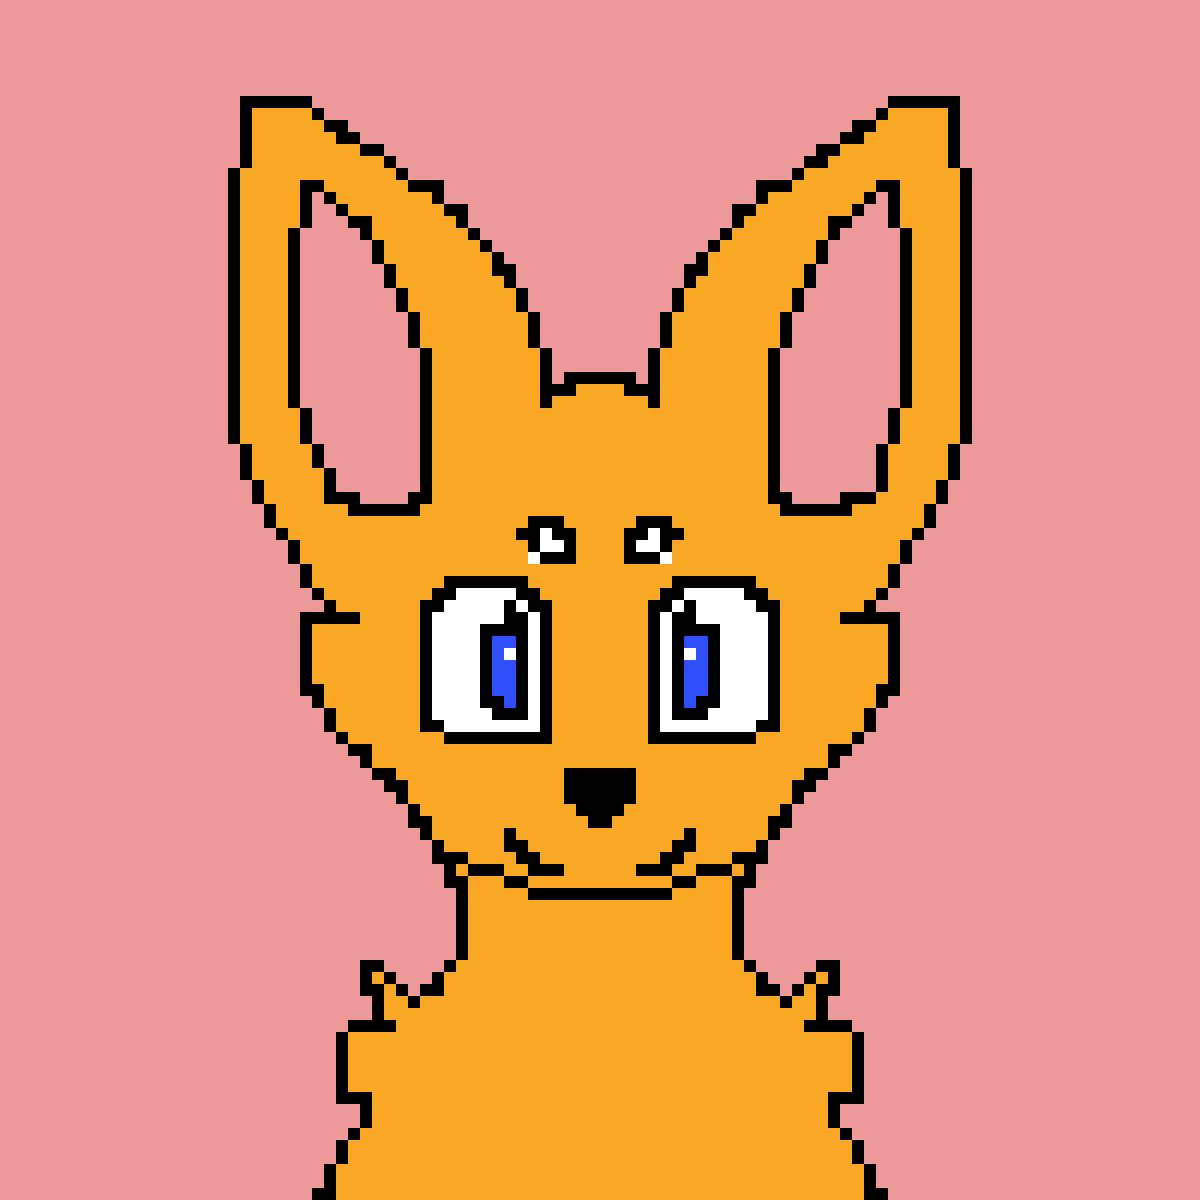 Cute Fox I guess:3 by bohemianl0ser